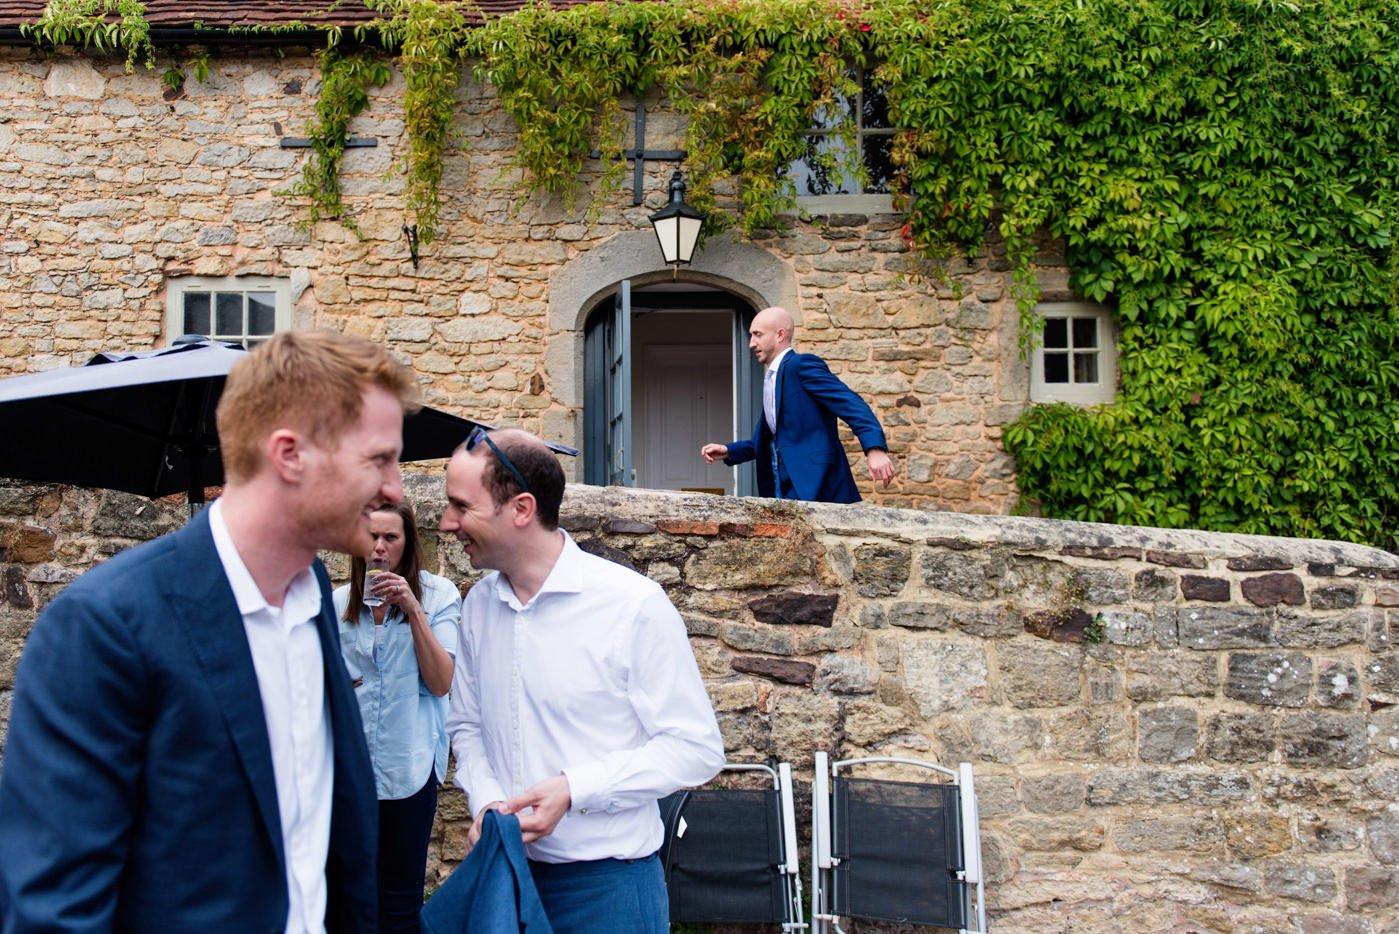 bignor-park-wedding-photography-robyn-and-tom-14